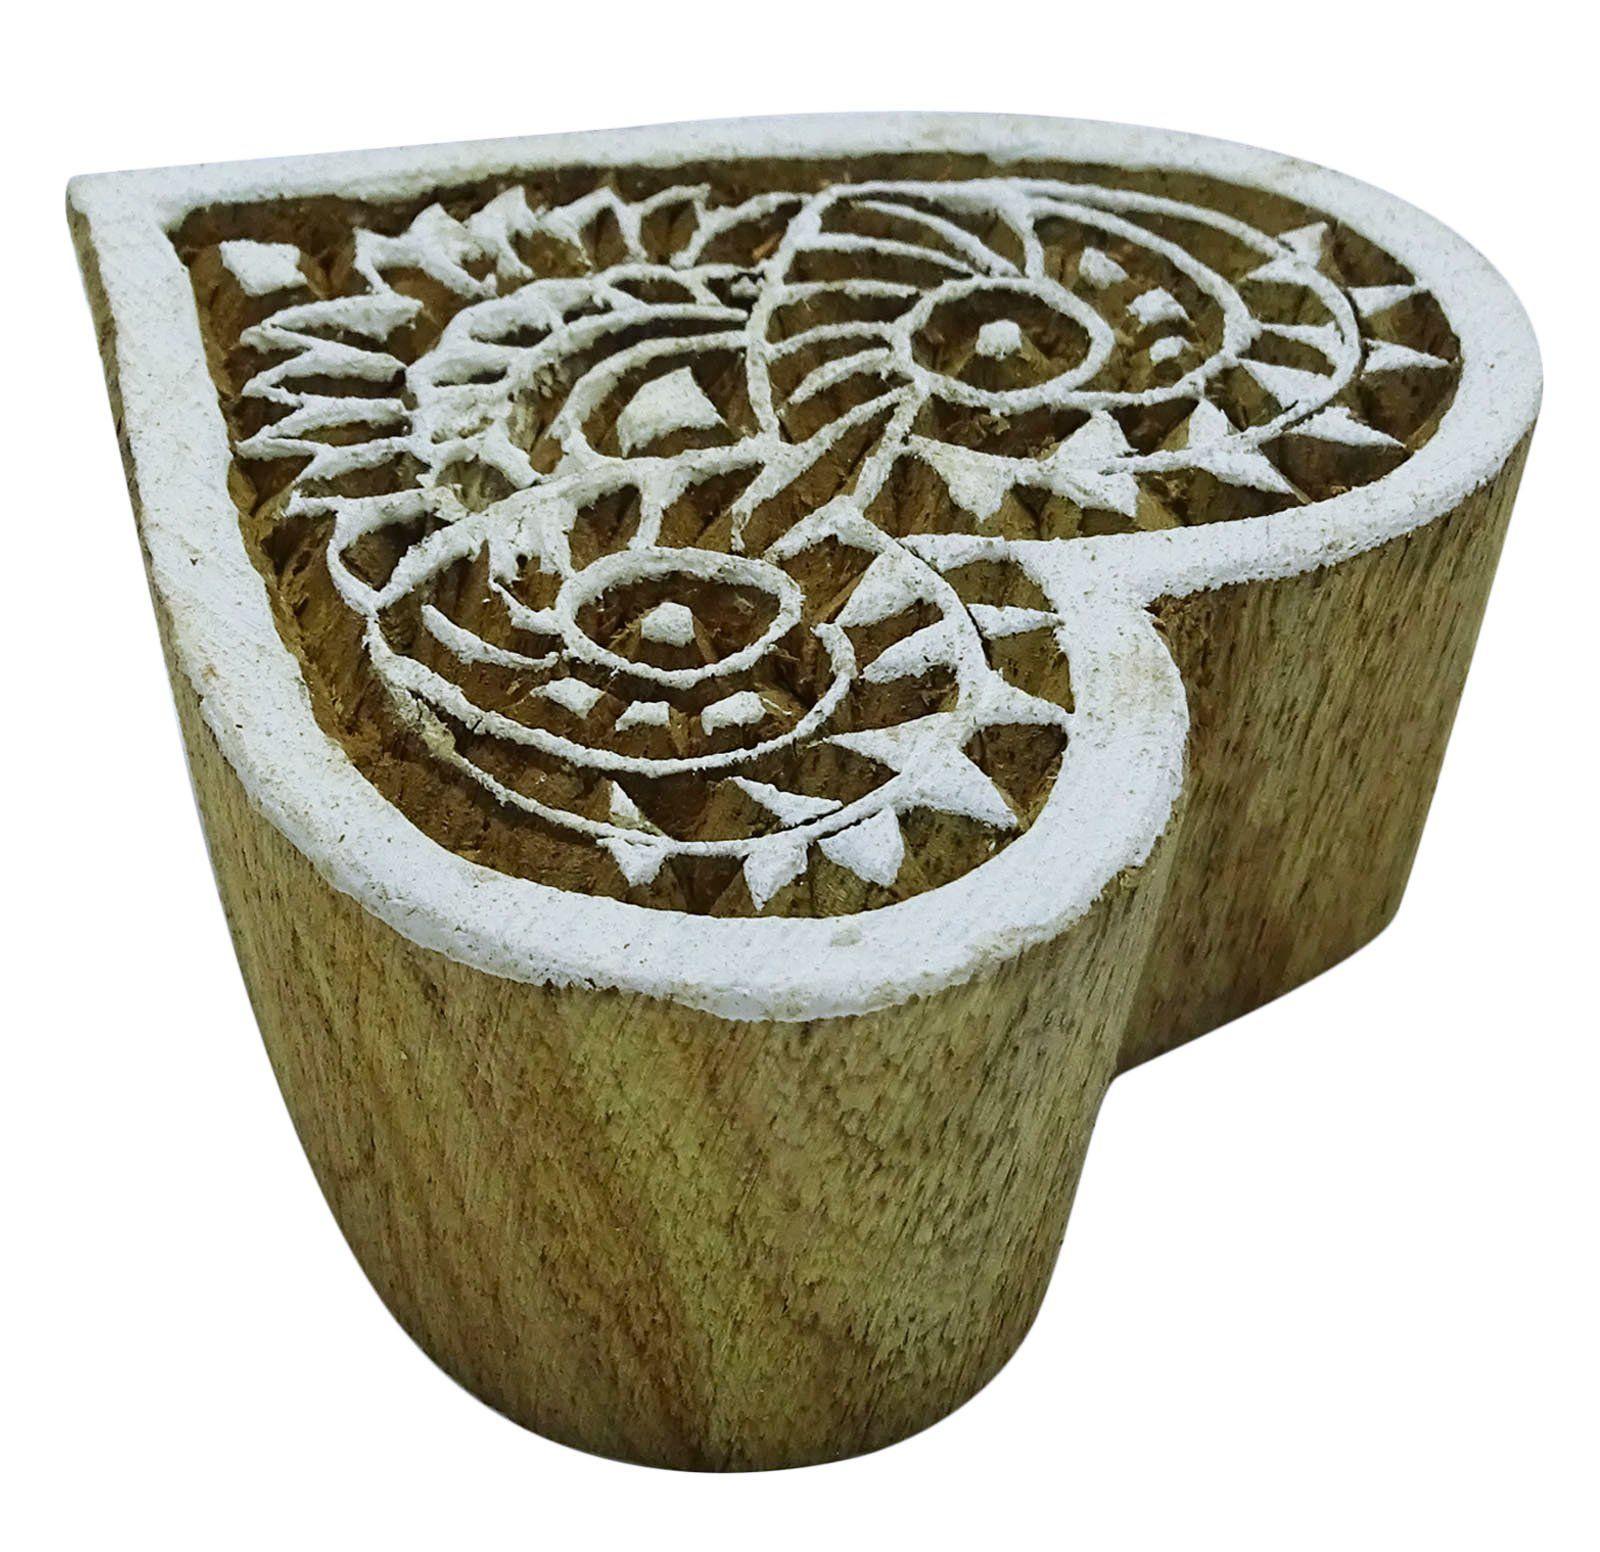 Hand carved Brown Printing Block Wooden Textile Stamp Floral Stamp Block print